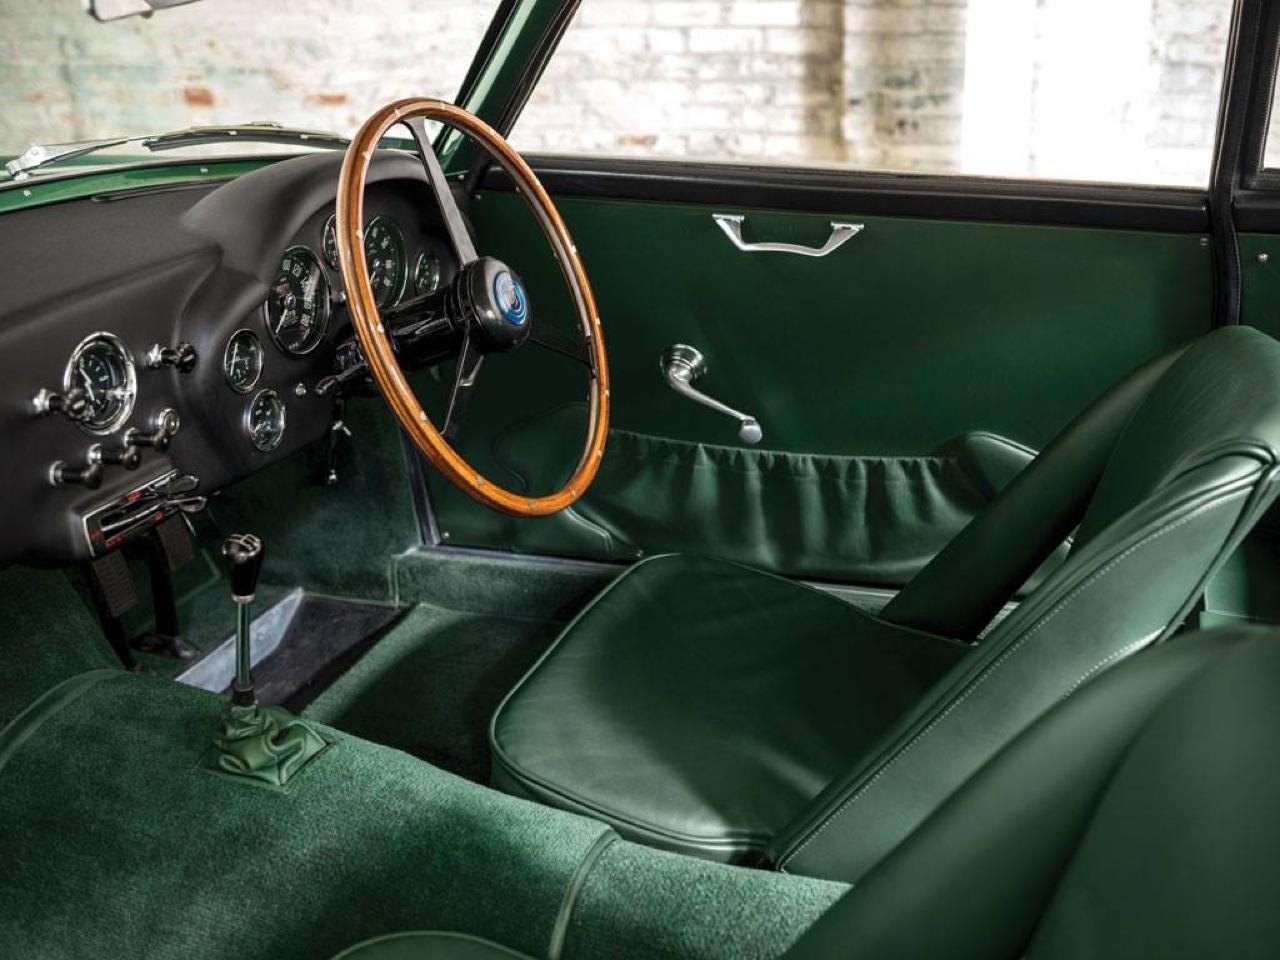 Aston Martin DB4 GT Zagato - Mangeuse de Ferrari ! 3